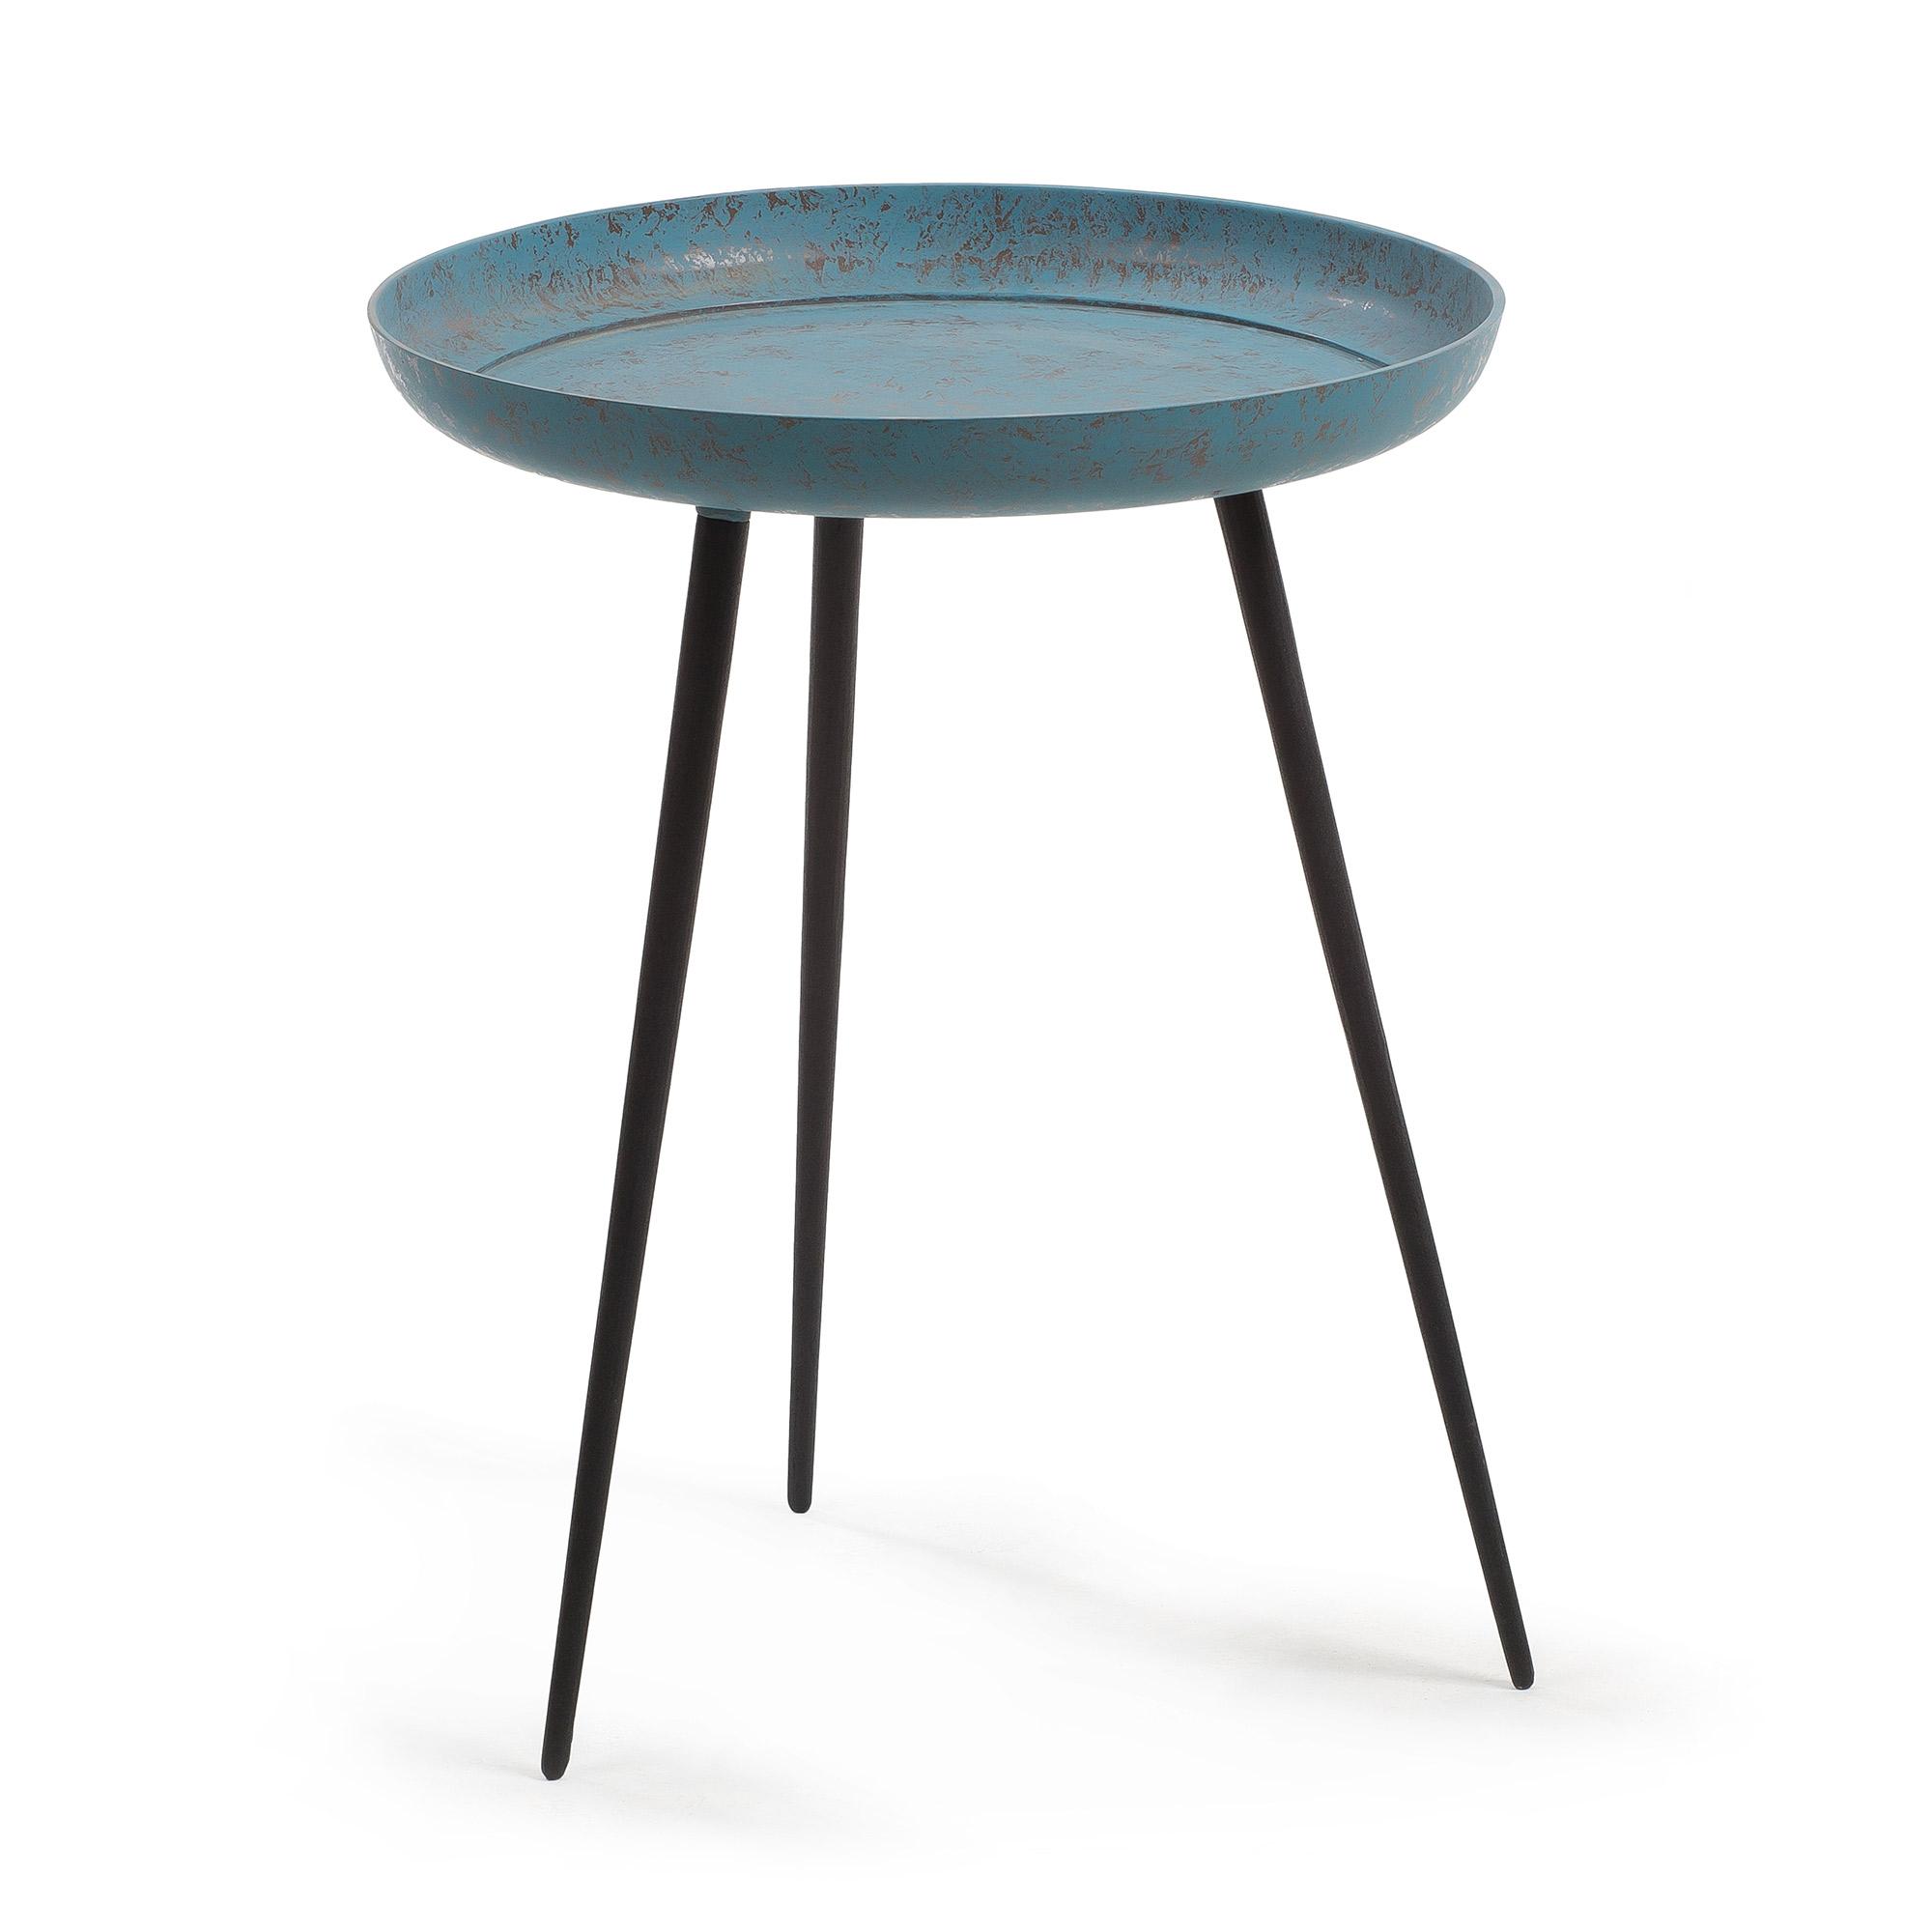 Kave home - table d'appoint sence Ø 40 cm